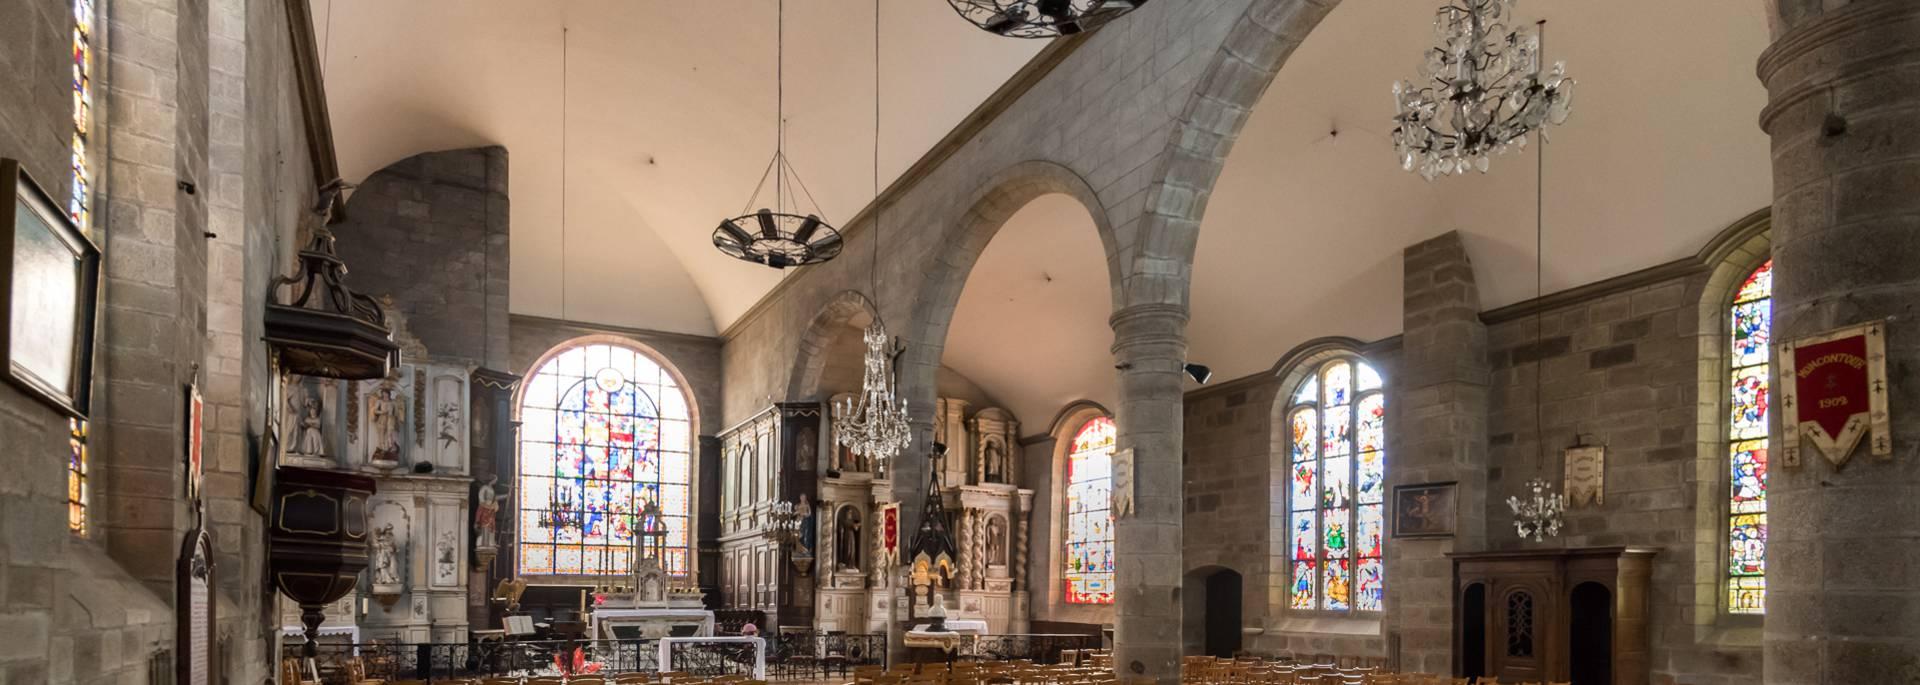 Eglise Moncontour